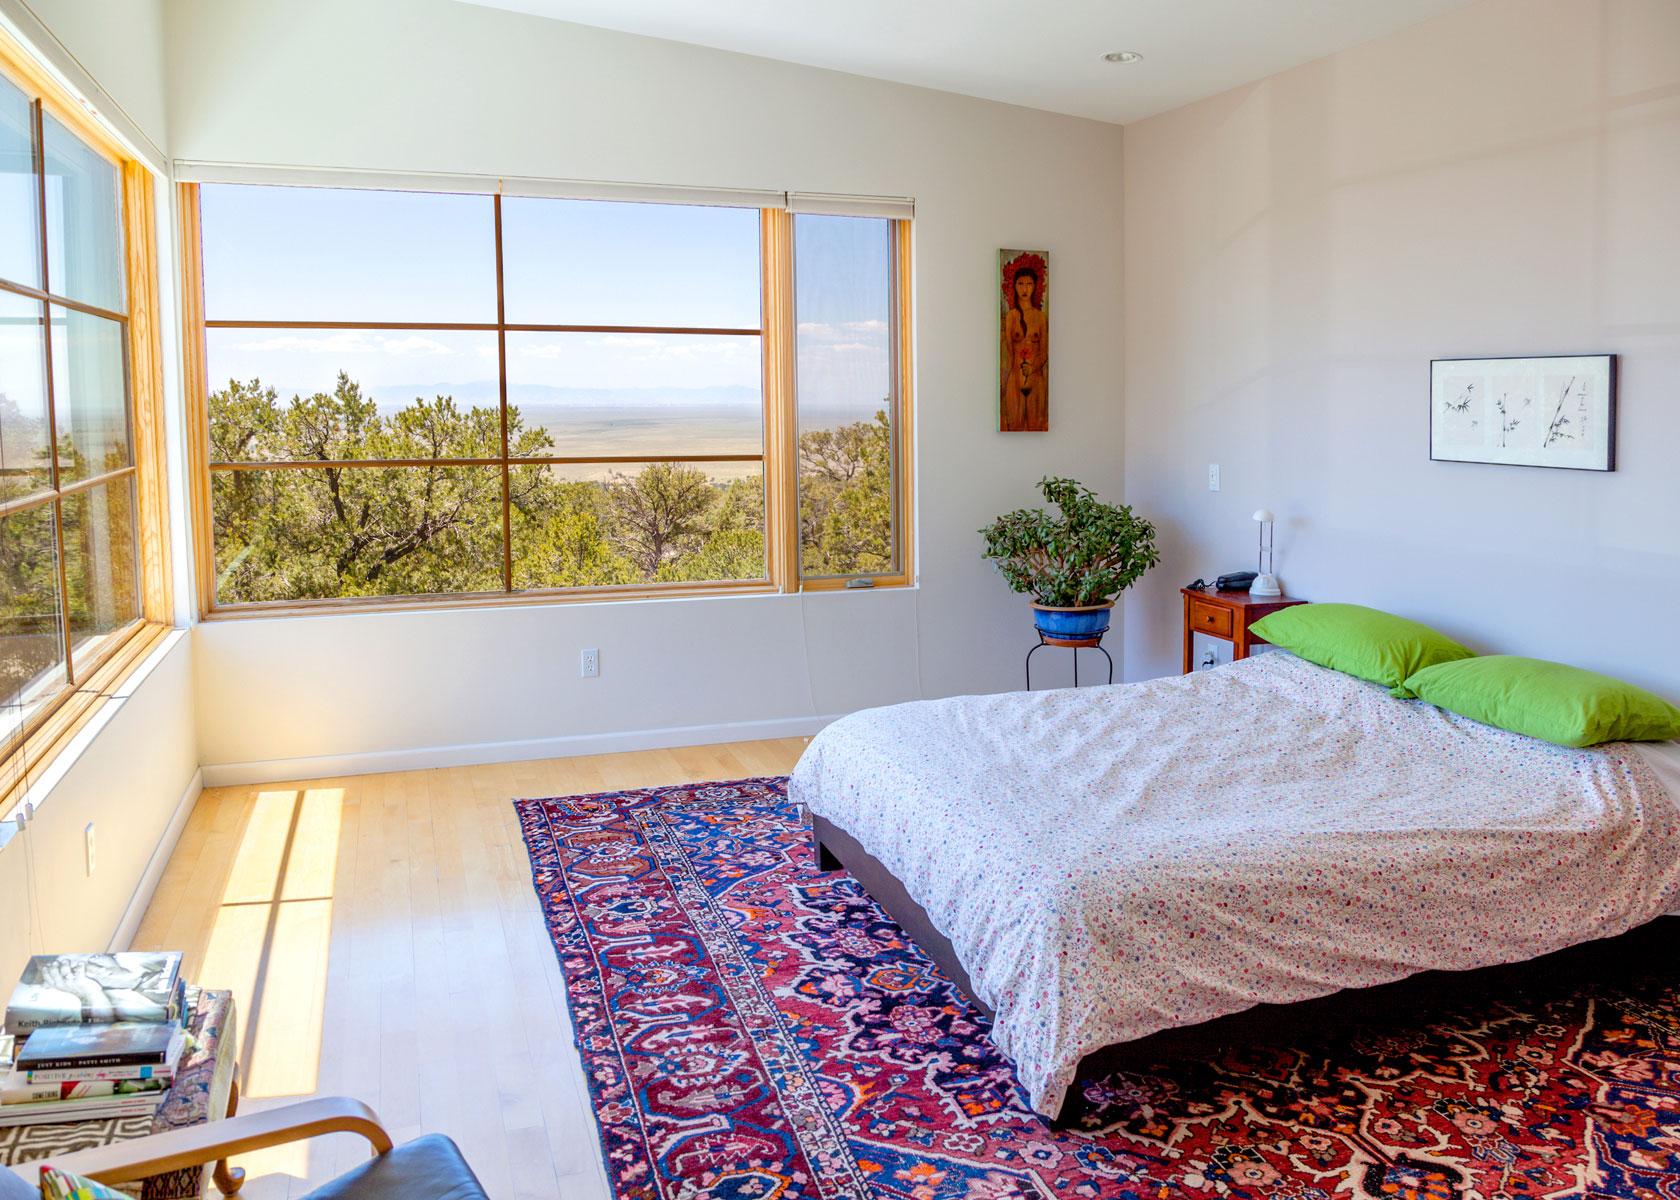 Darlene yarbrough real estate crestone colorado for Master bedroom living area